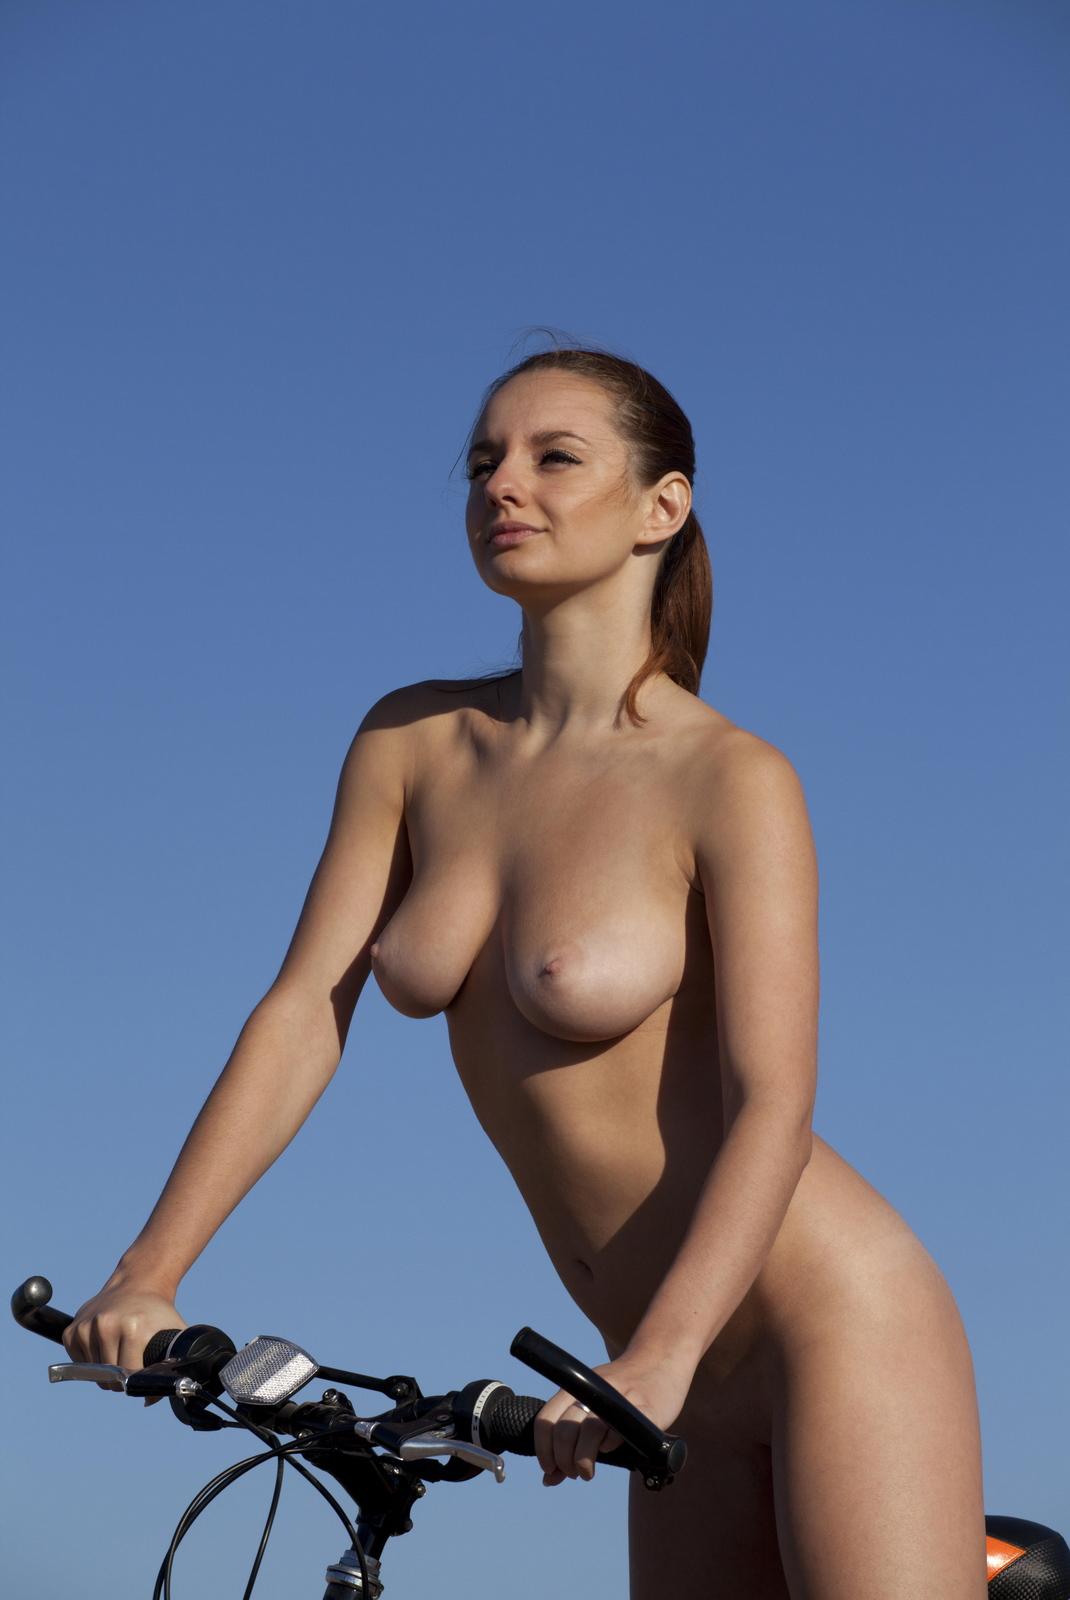 mishel-c-bicycle-boobs-naked-domai-35